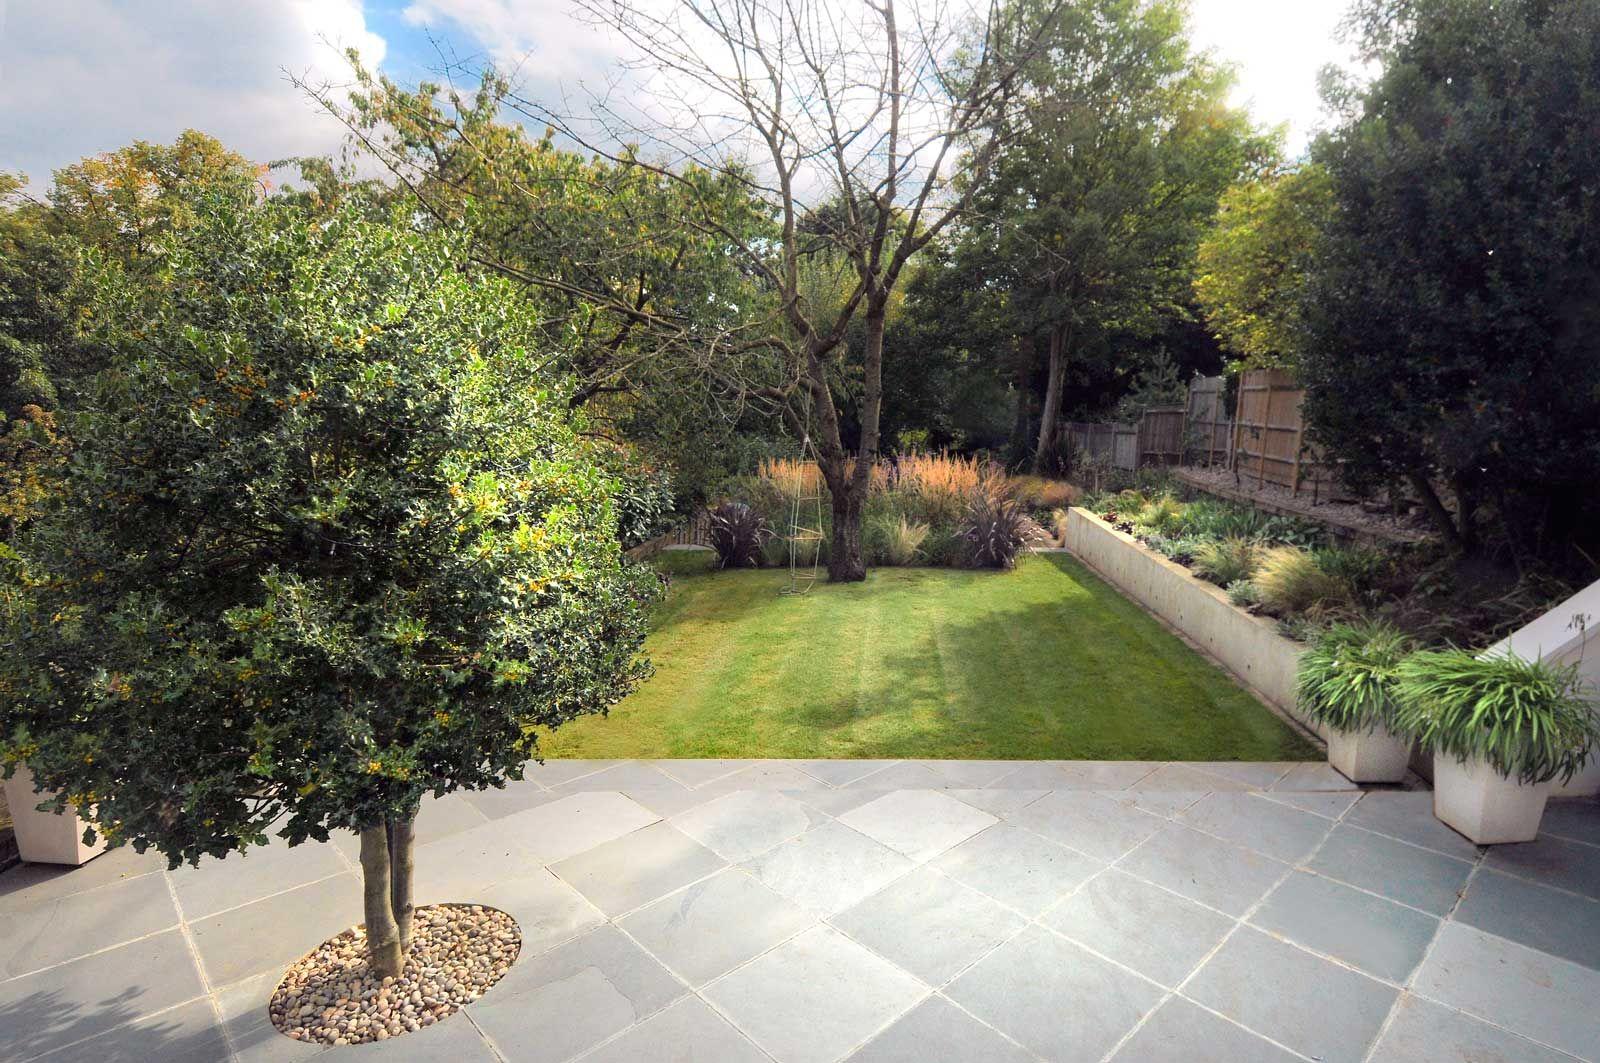 Garden Design In Crystal Palace South East London Jardines Diseno De Jardin Paisajismo